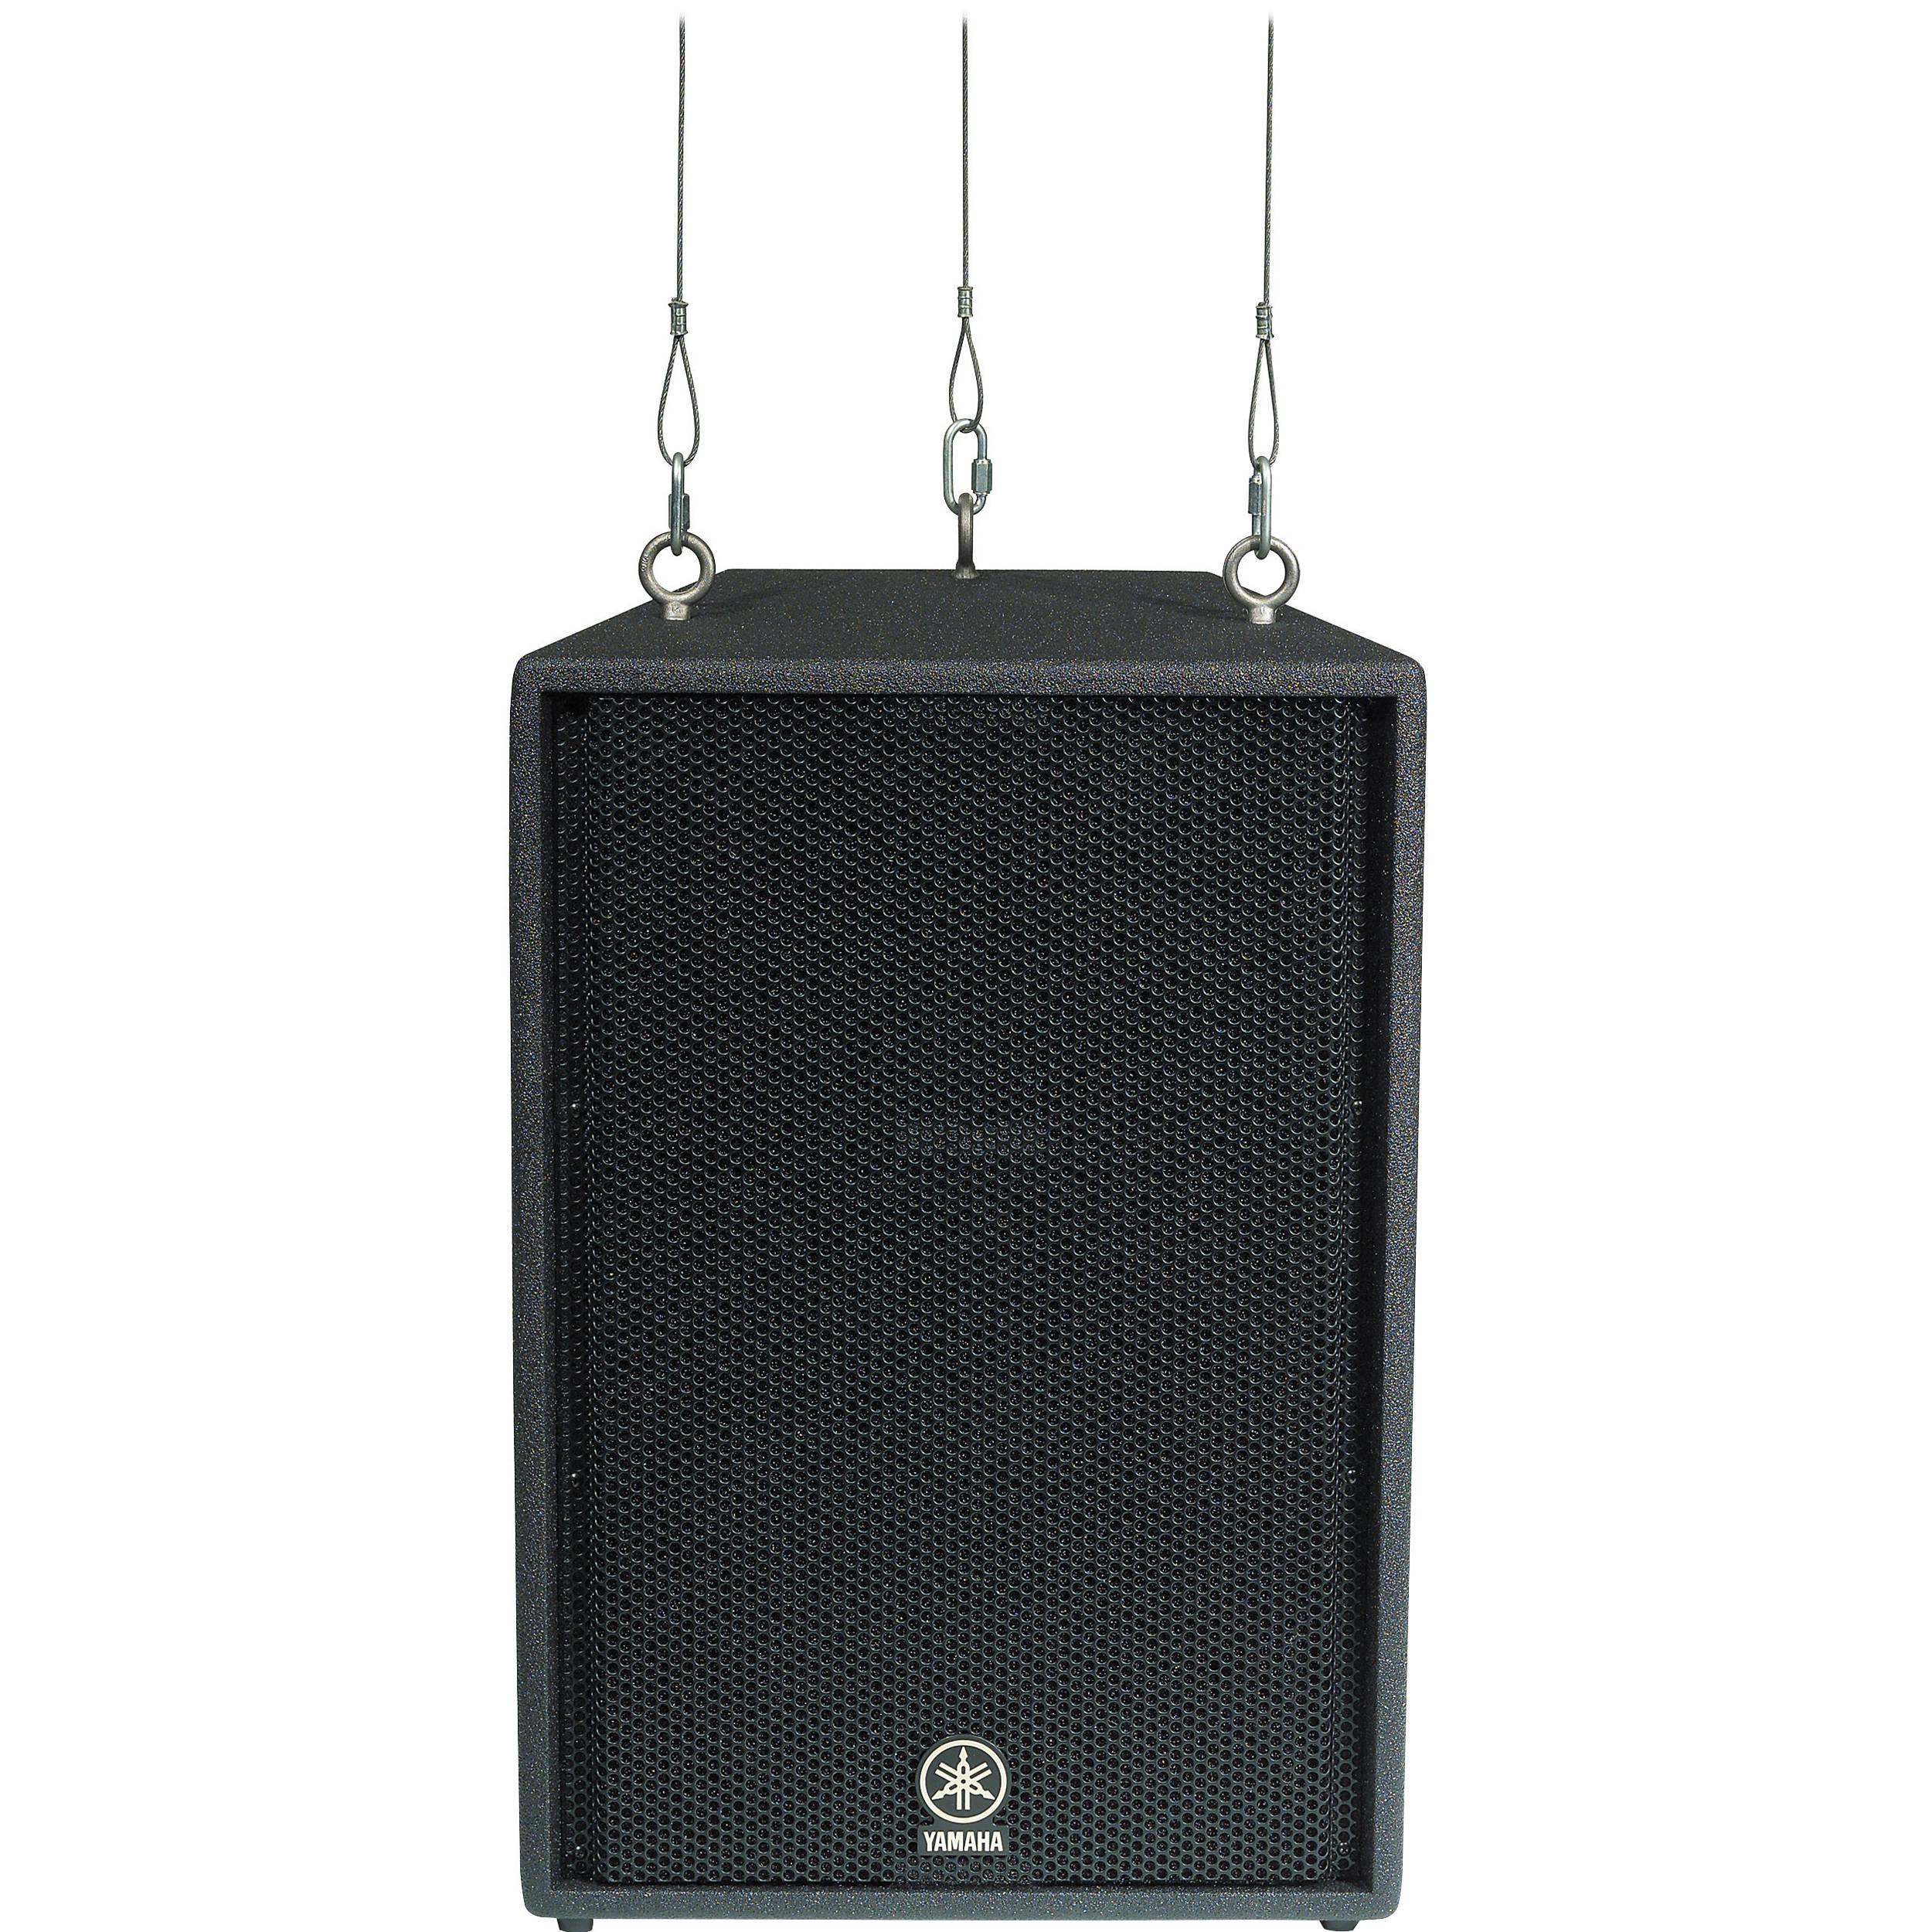 Yamaha Concert Club Series Speakers